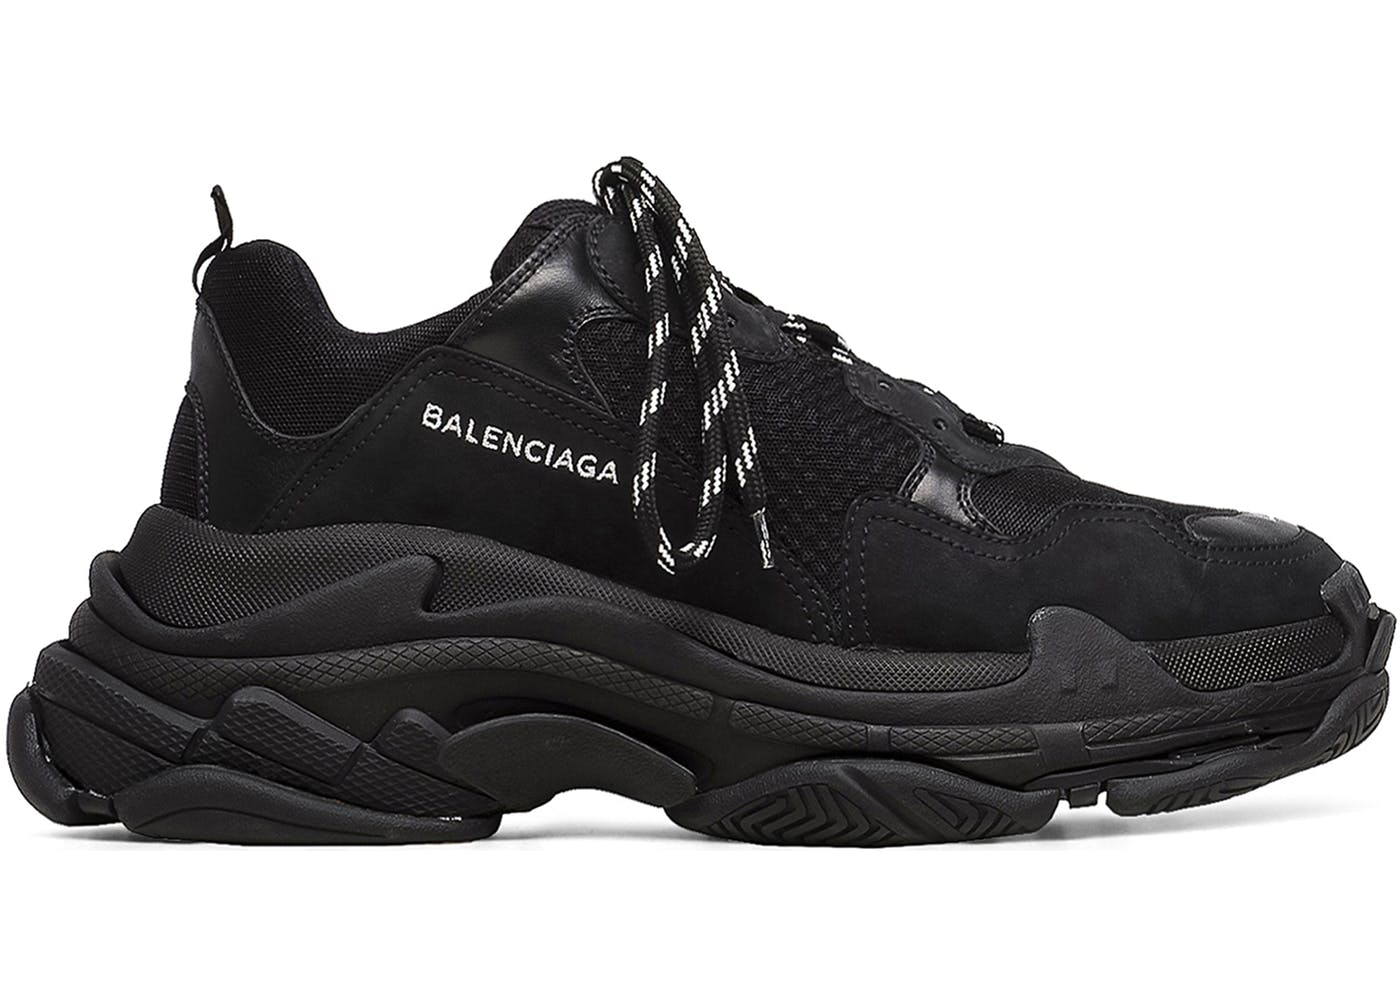 Balenciaga Triple S Triple Black(バレンシアガトリプルソールトリプルブラック) ブラック